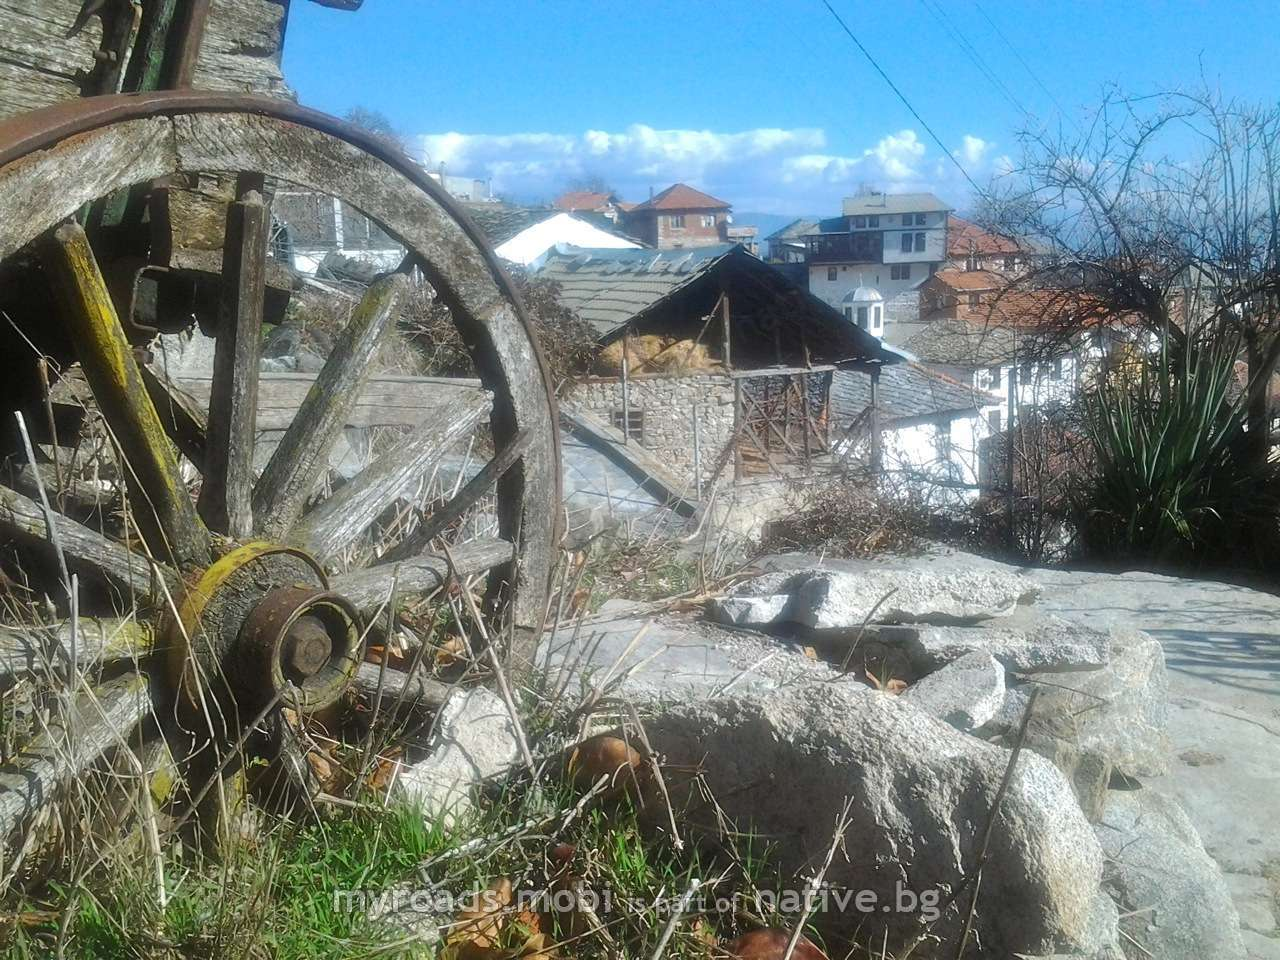 Село Делчево – малък таблетен репортаж